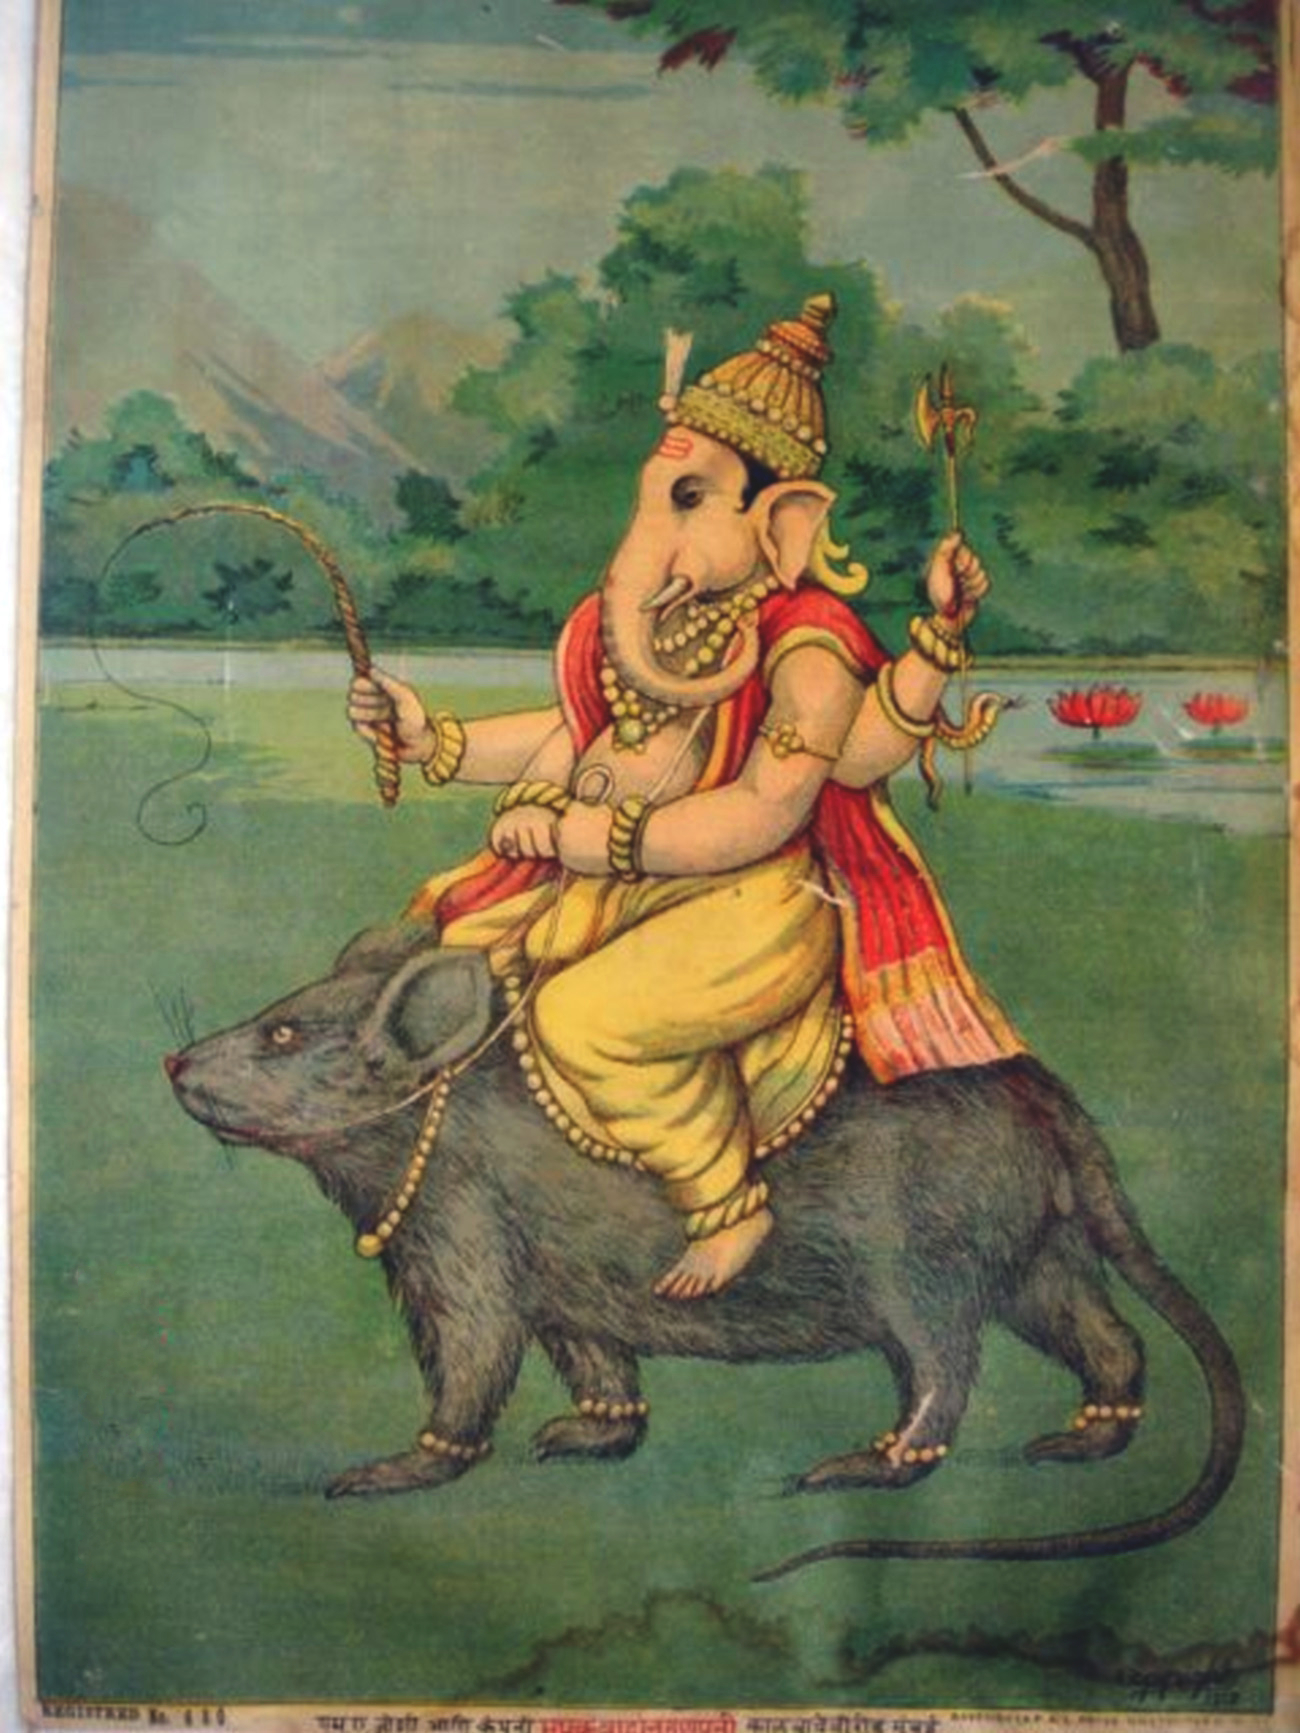 Ganesha auf seiner Ratte (Raja Ravi Varma)